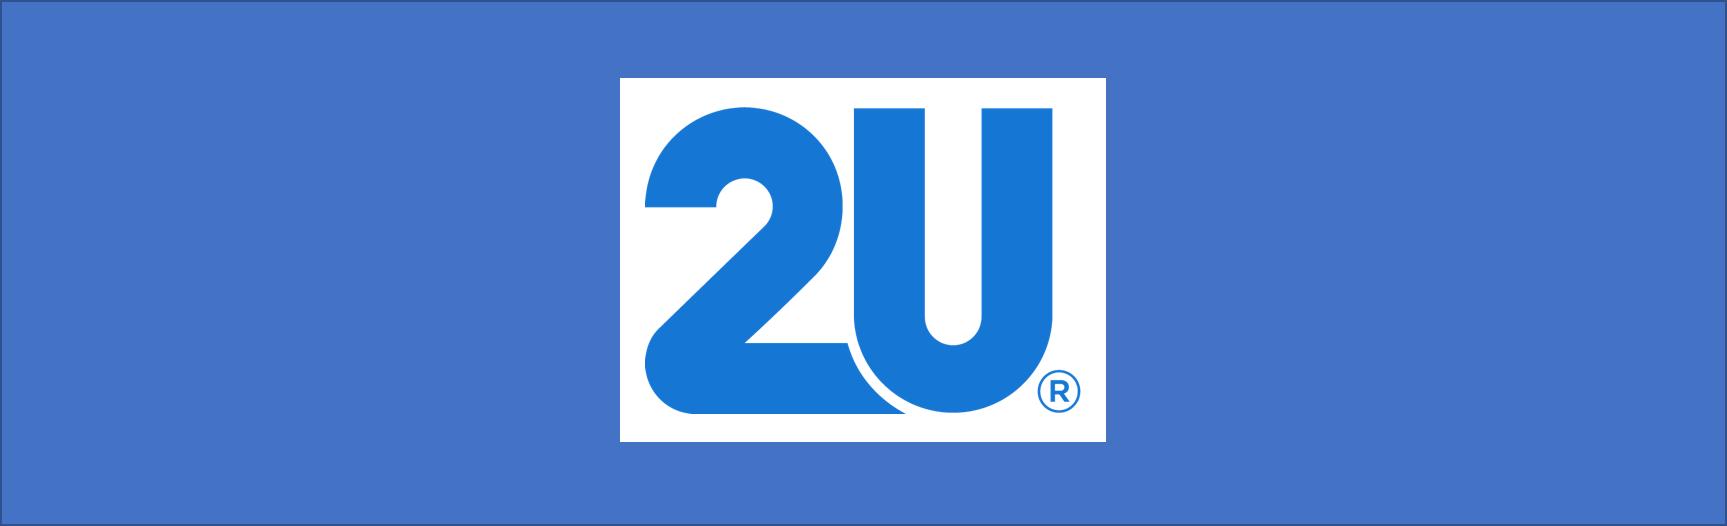 2U-banner-logo-5